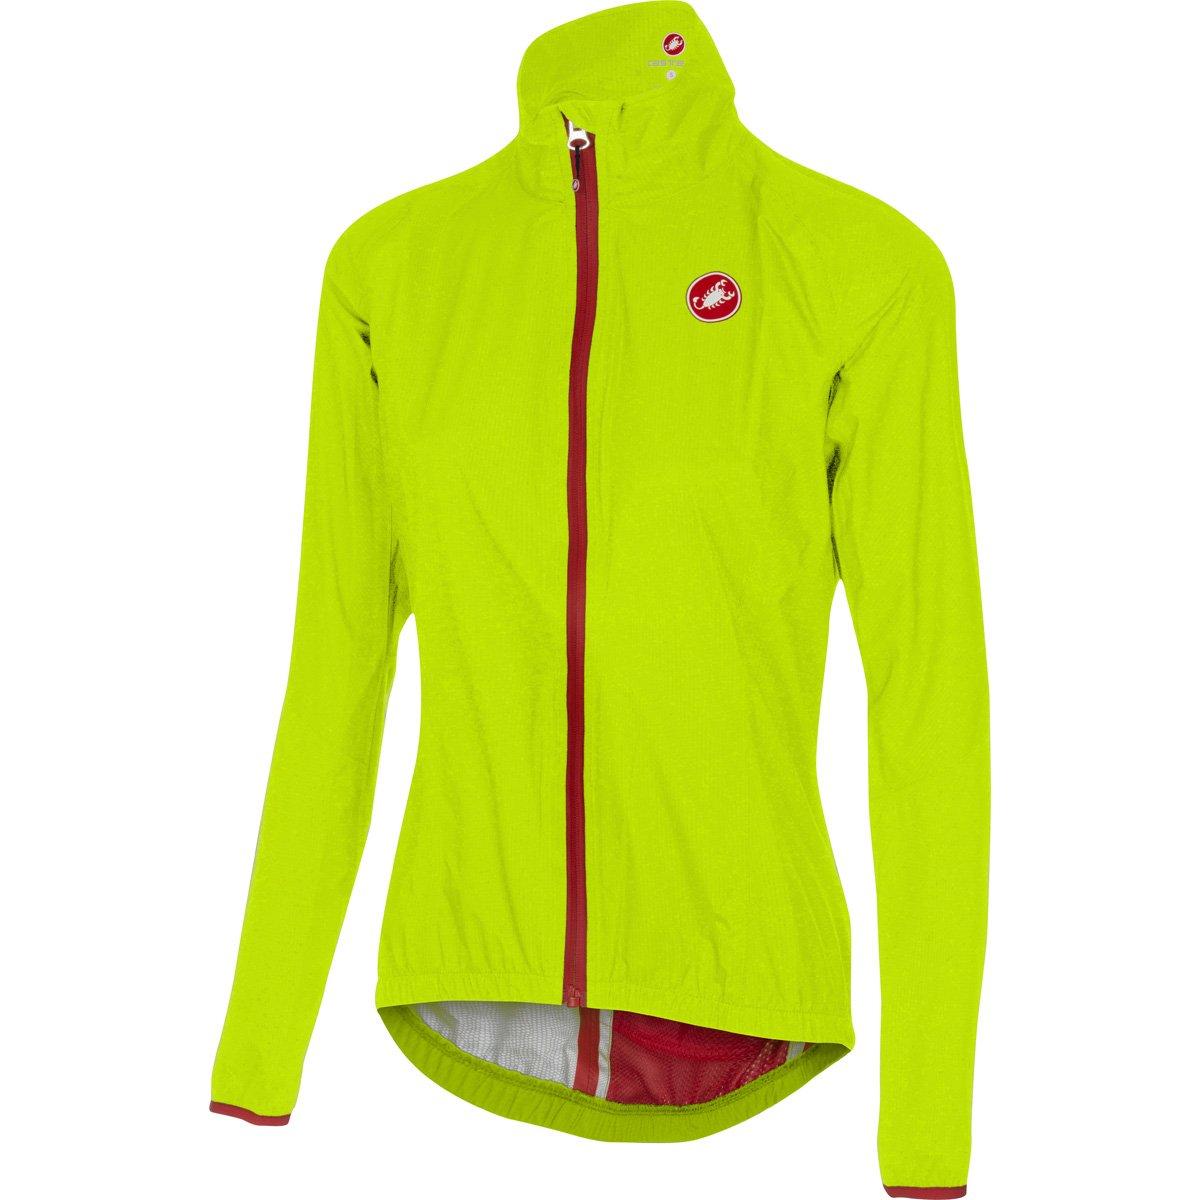 Castelli Riparo Jacket – Women 's B01M1Z0711 X-Small|イエロー(Yellow Fluo) イエロー(Yellow Fluo) X-Small